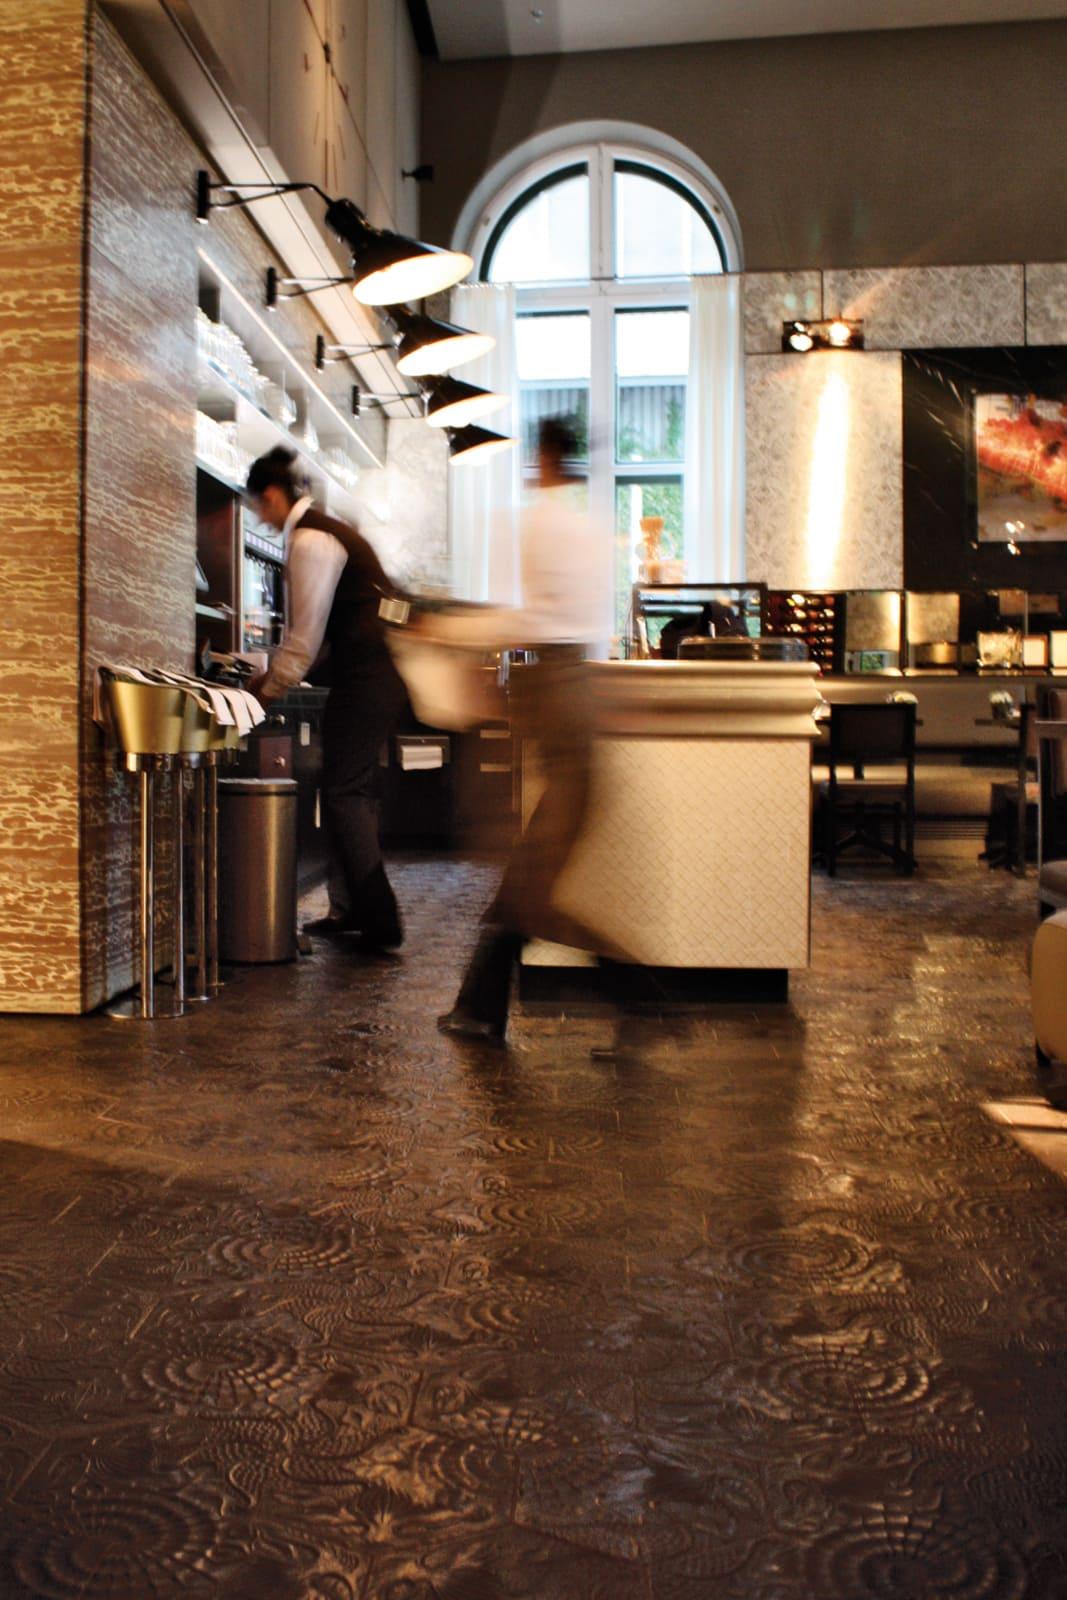 zementfliesen-terrazzofliesen-kreidefarbe-terrazzo-fugenlos-viaplatten-60G-hotel | N° 60G